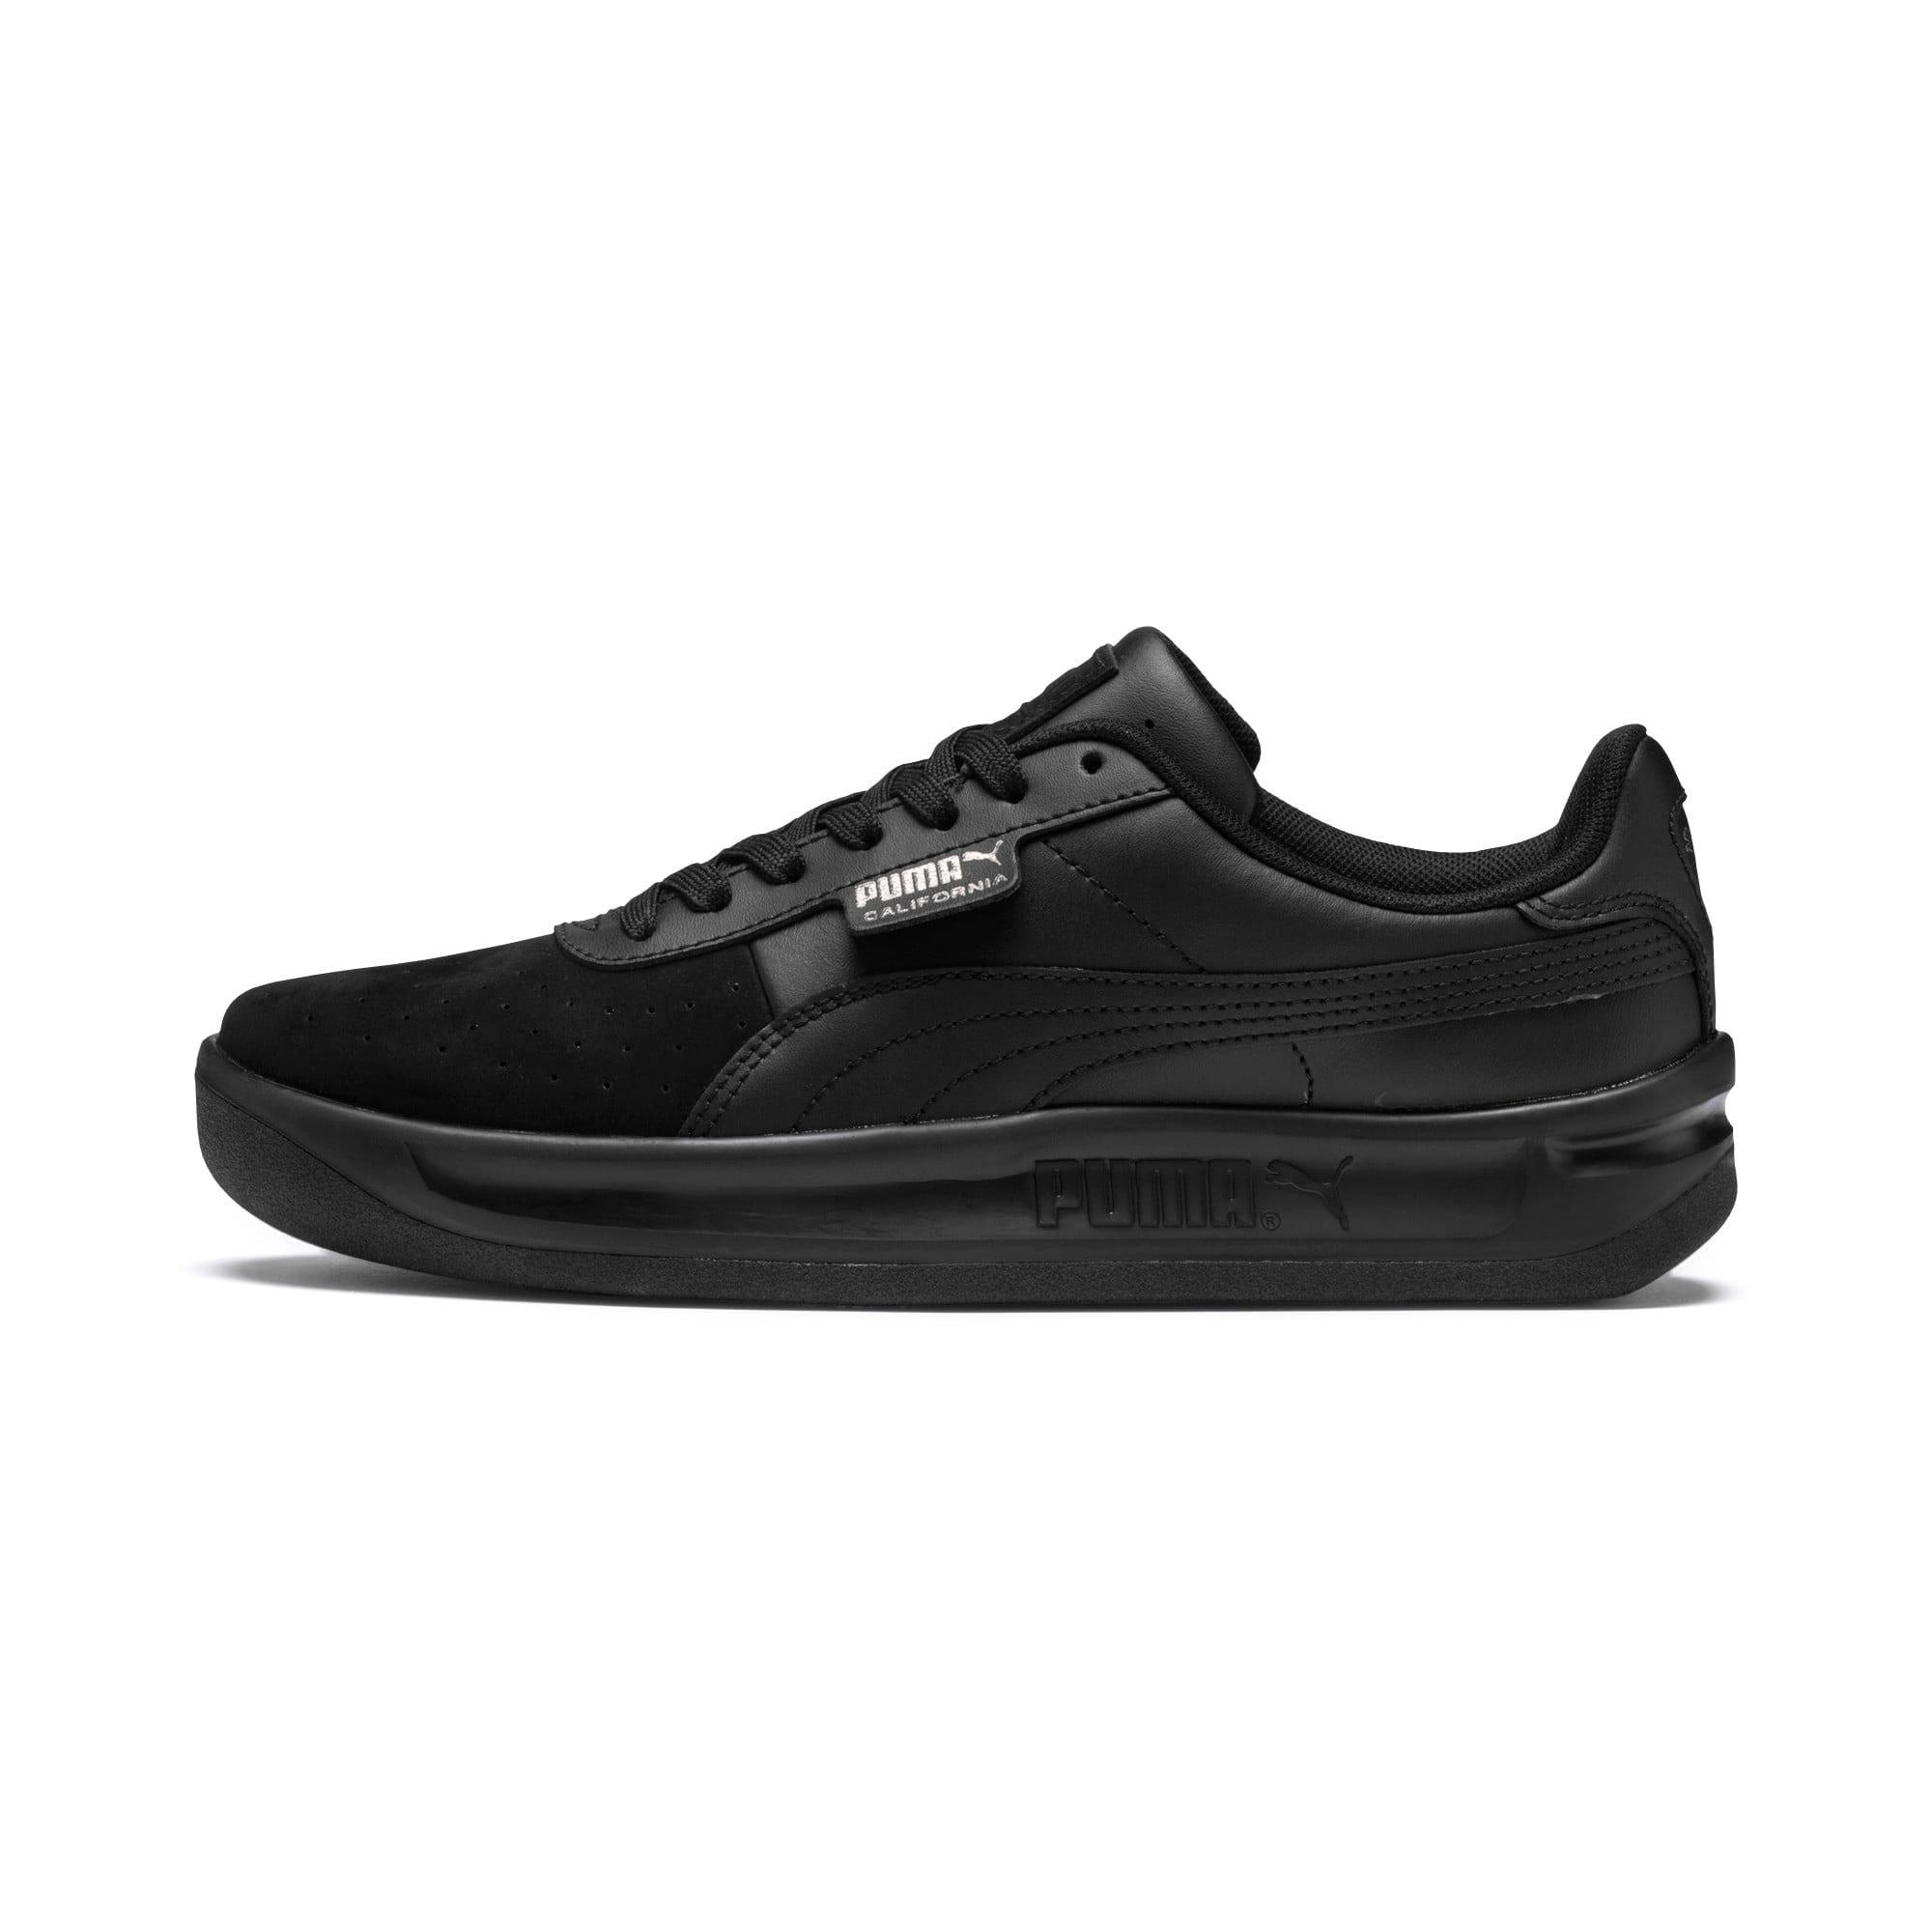 Thumbnail 1 of California Exotic Women's Sneakers, Puma Black-Metallic Ash, medium